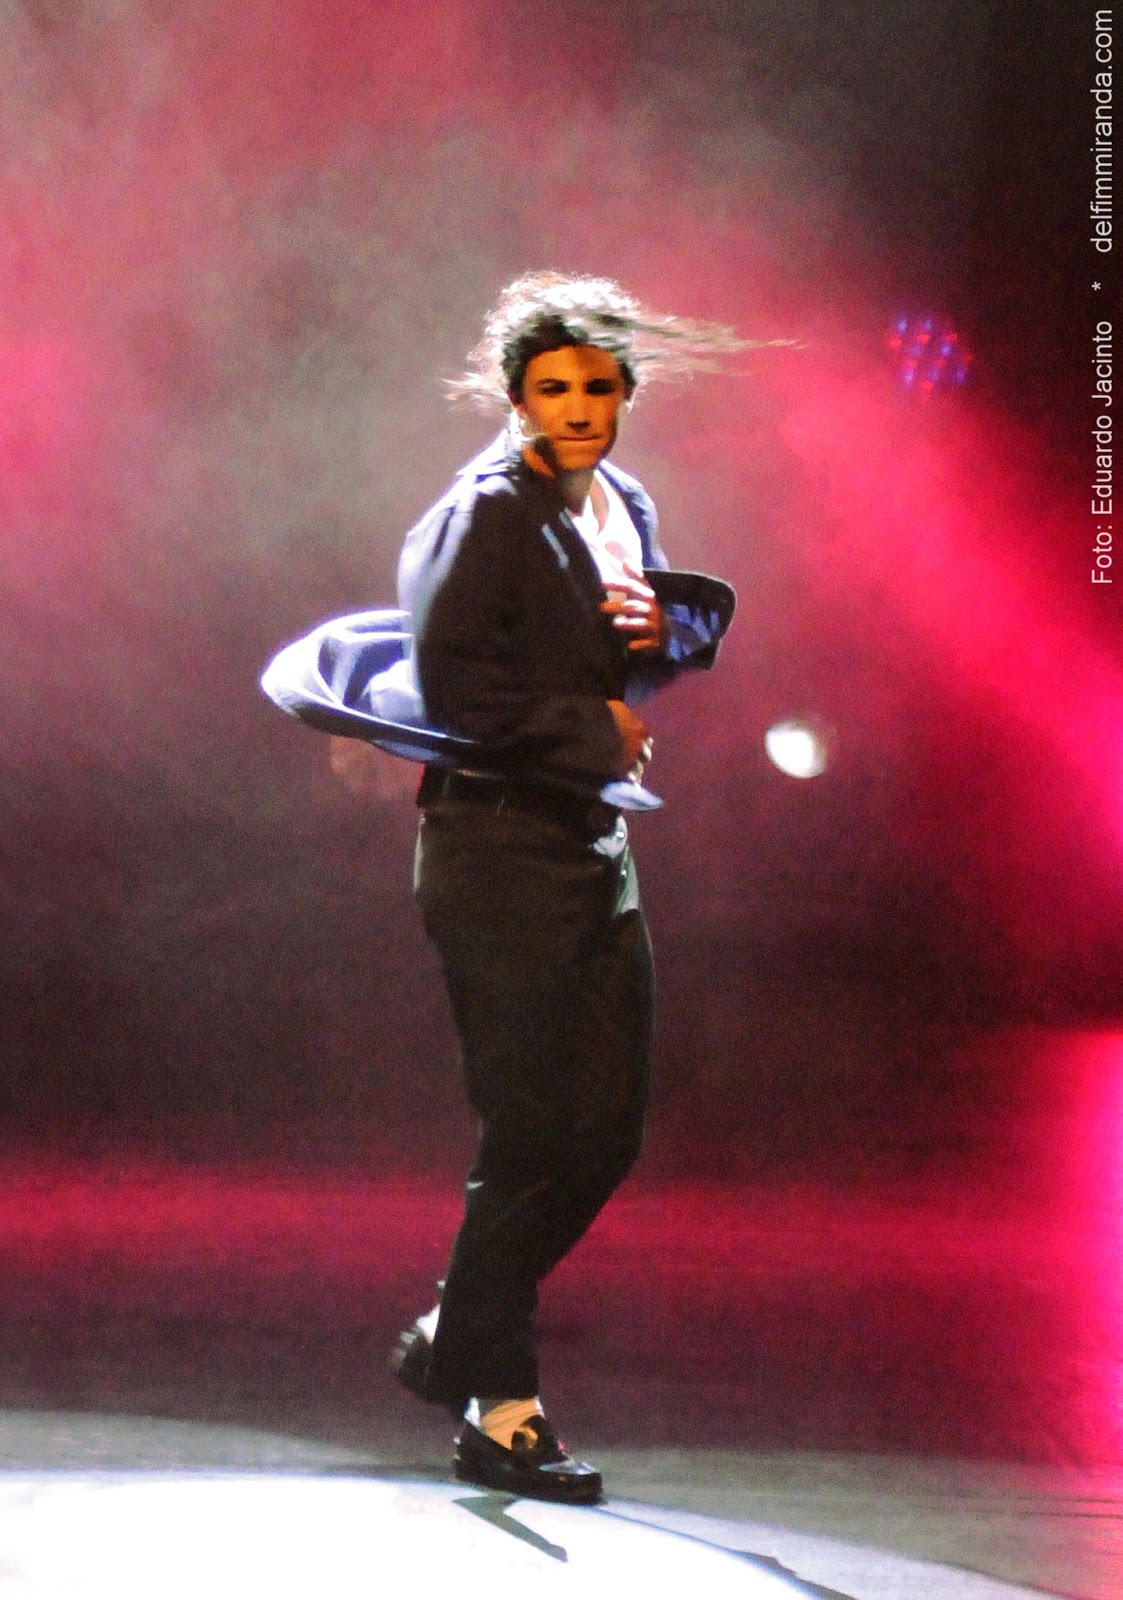 Delfim Miranda - Michael Jackson Tribute - Spinning